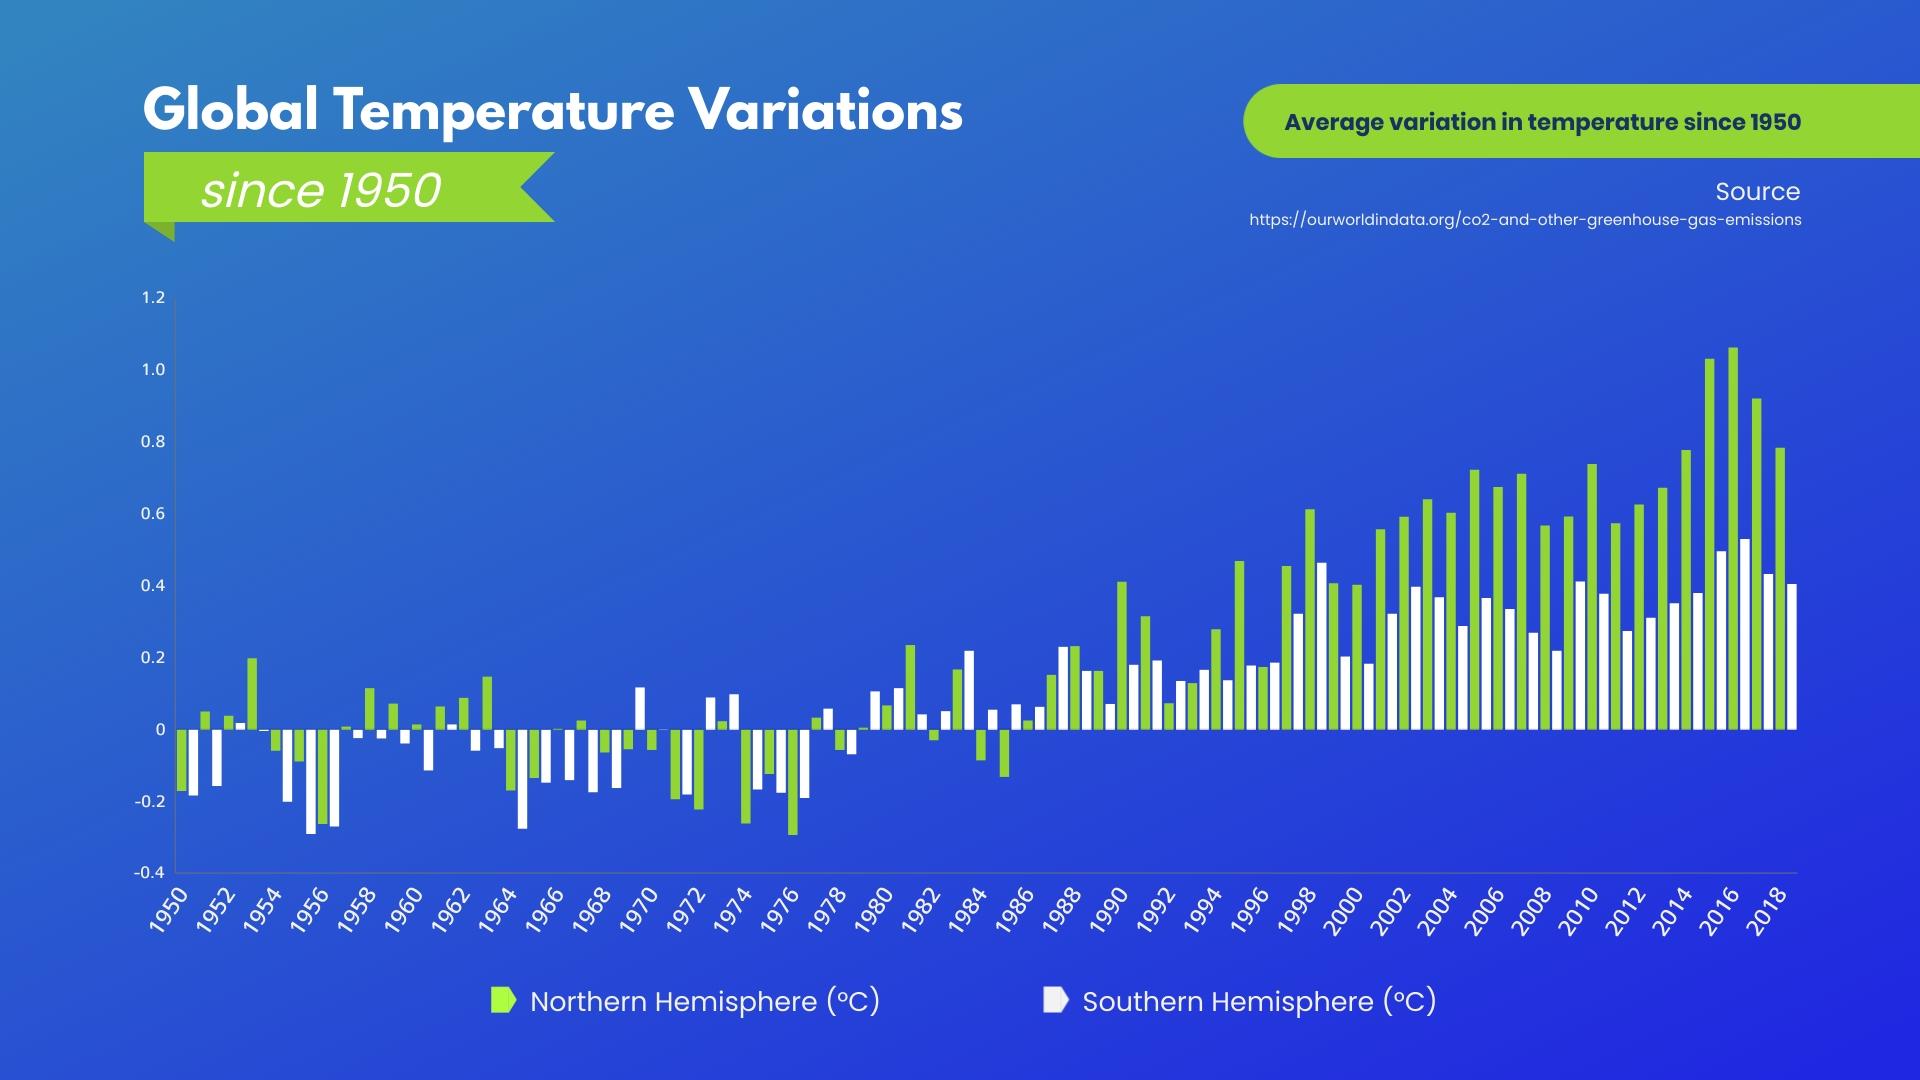 Global Temperature Variations Bar Graph Template